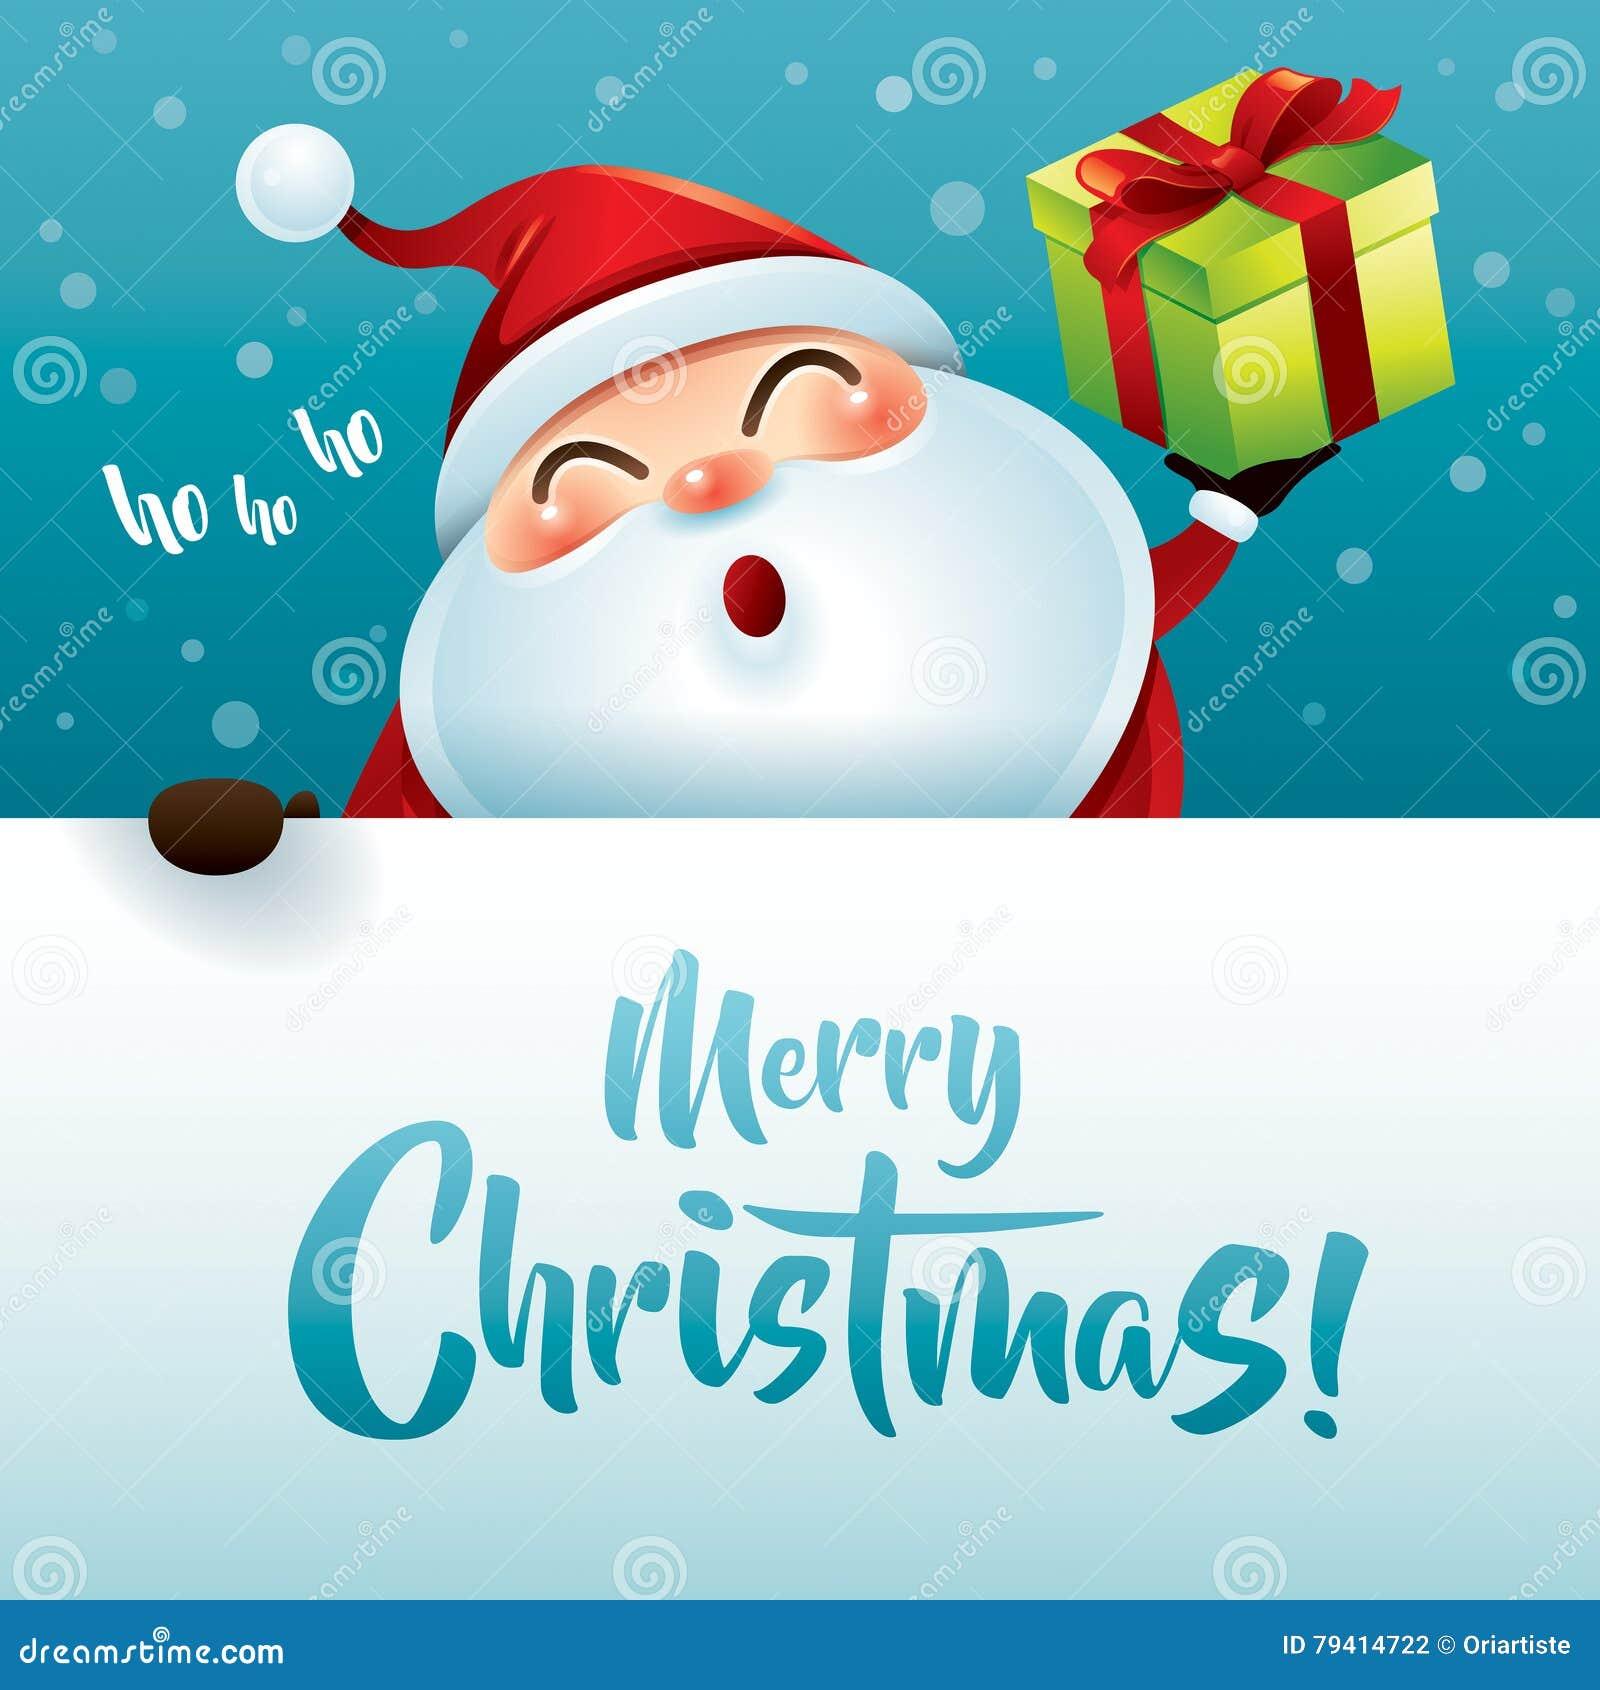 Ho Ho Ho Frohe Weihnachten.Ho Ho Ho Frohe Weihnachten Vektor Abbildung Illustration